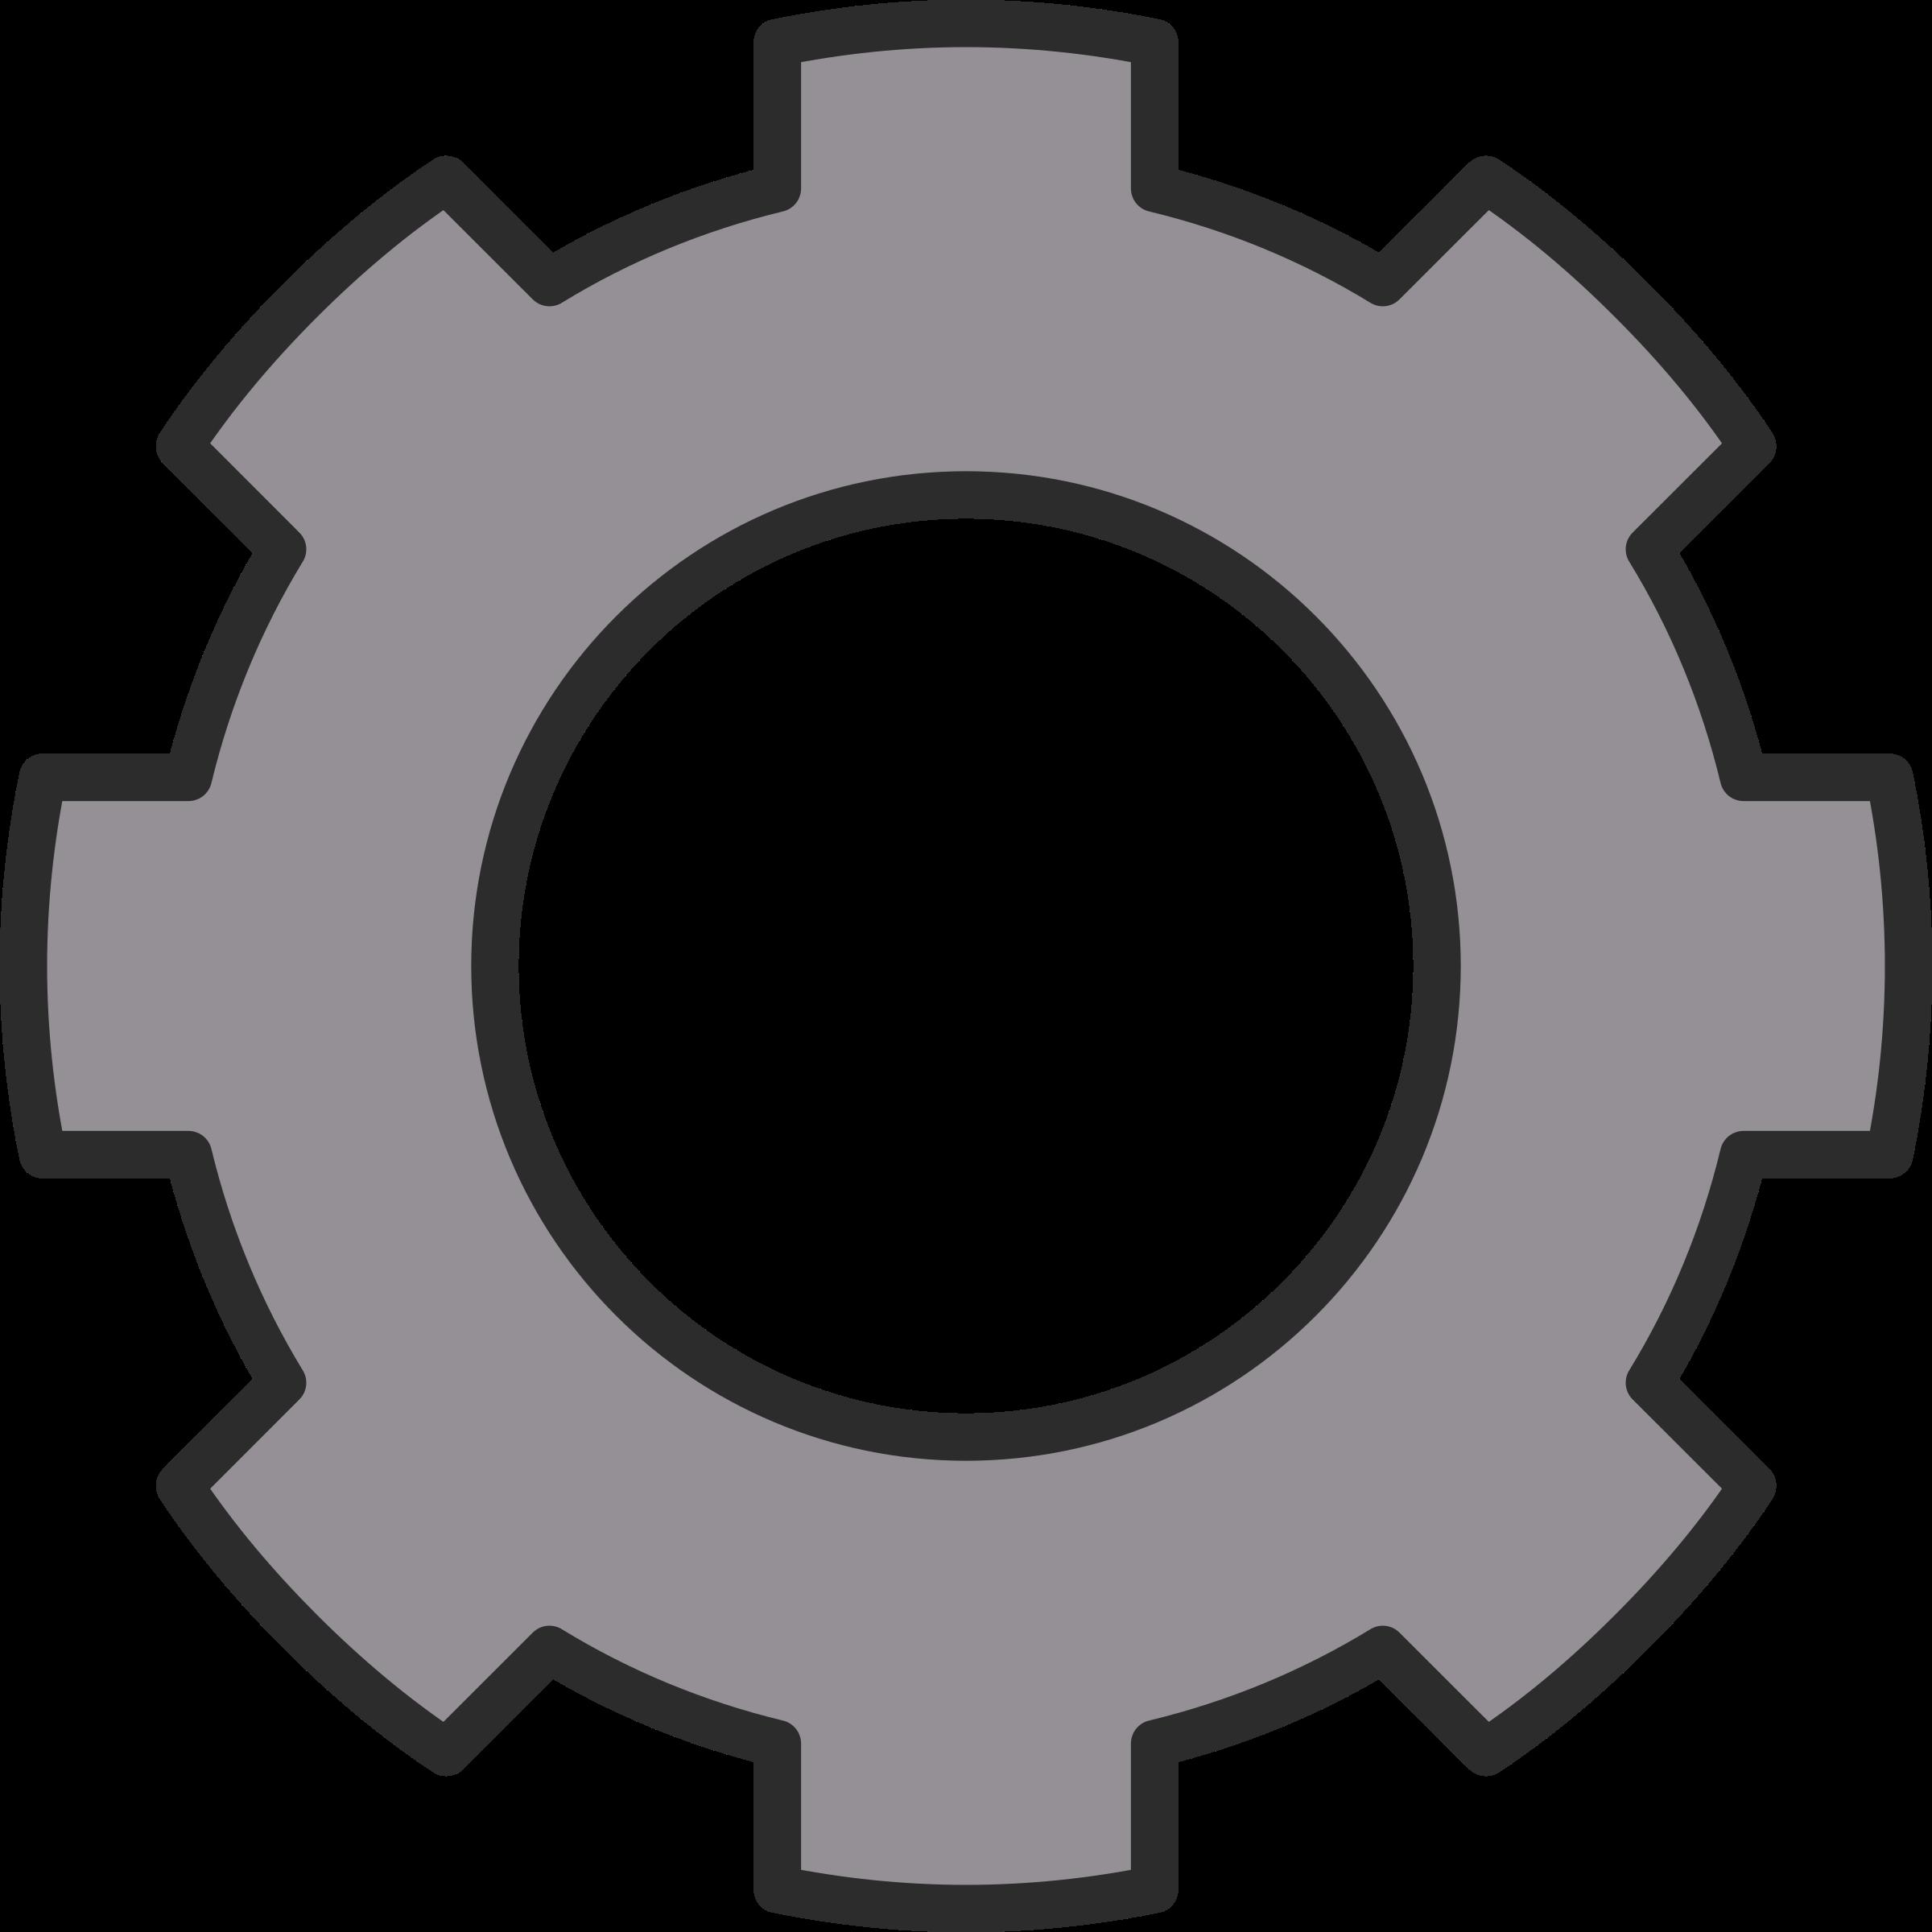 Cog zahnrad big image. Gear clipart cogwheel